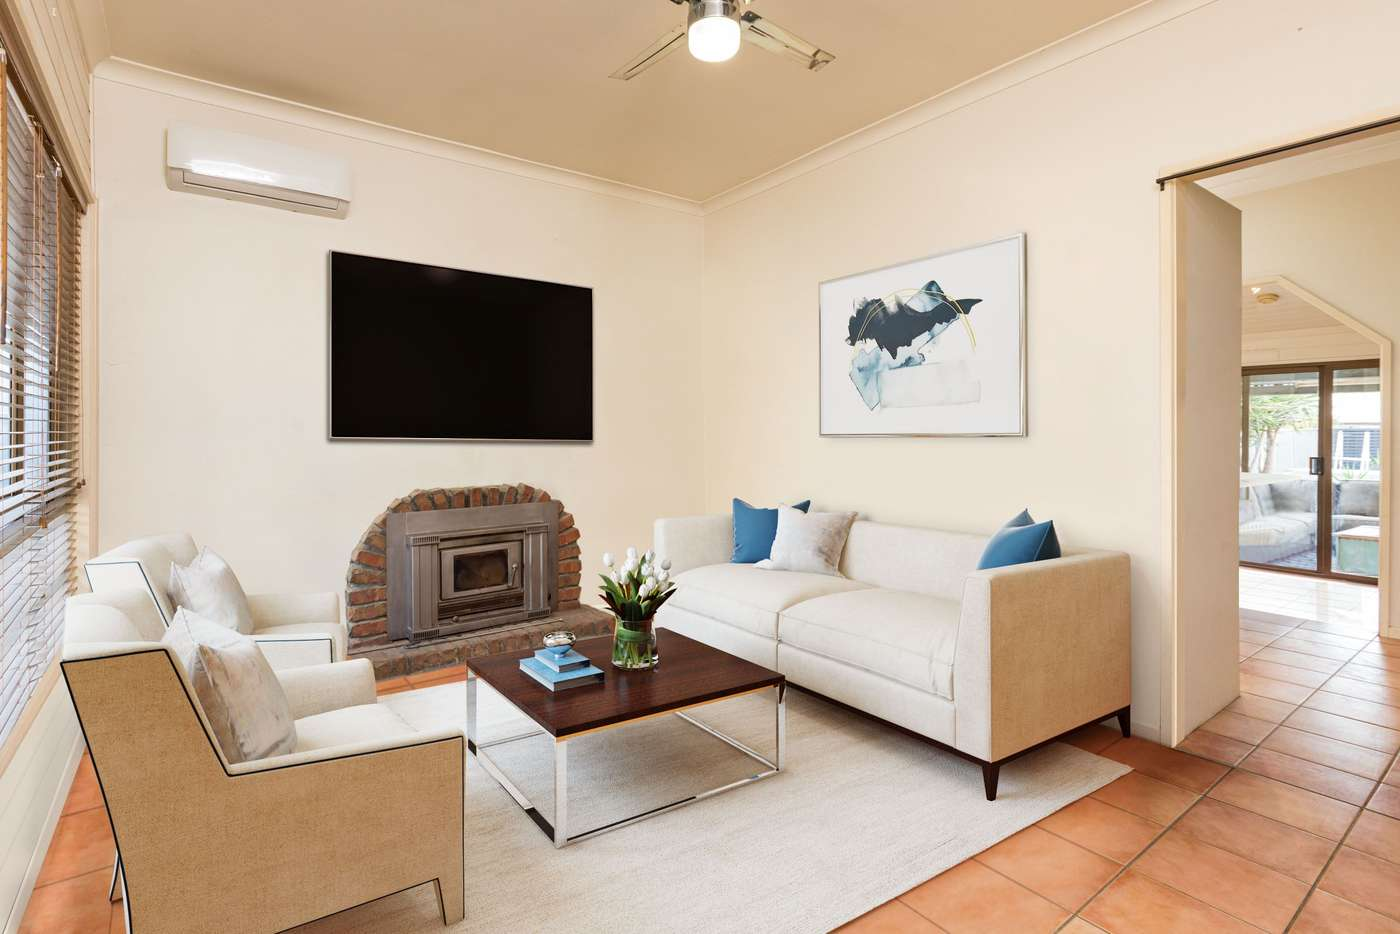 Seventh view of Homely house listing, 10 Dawn Avenue, Mildura VIC 3500